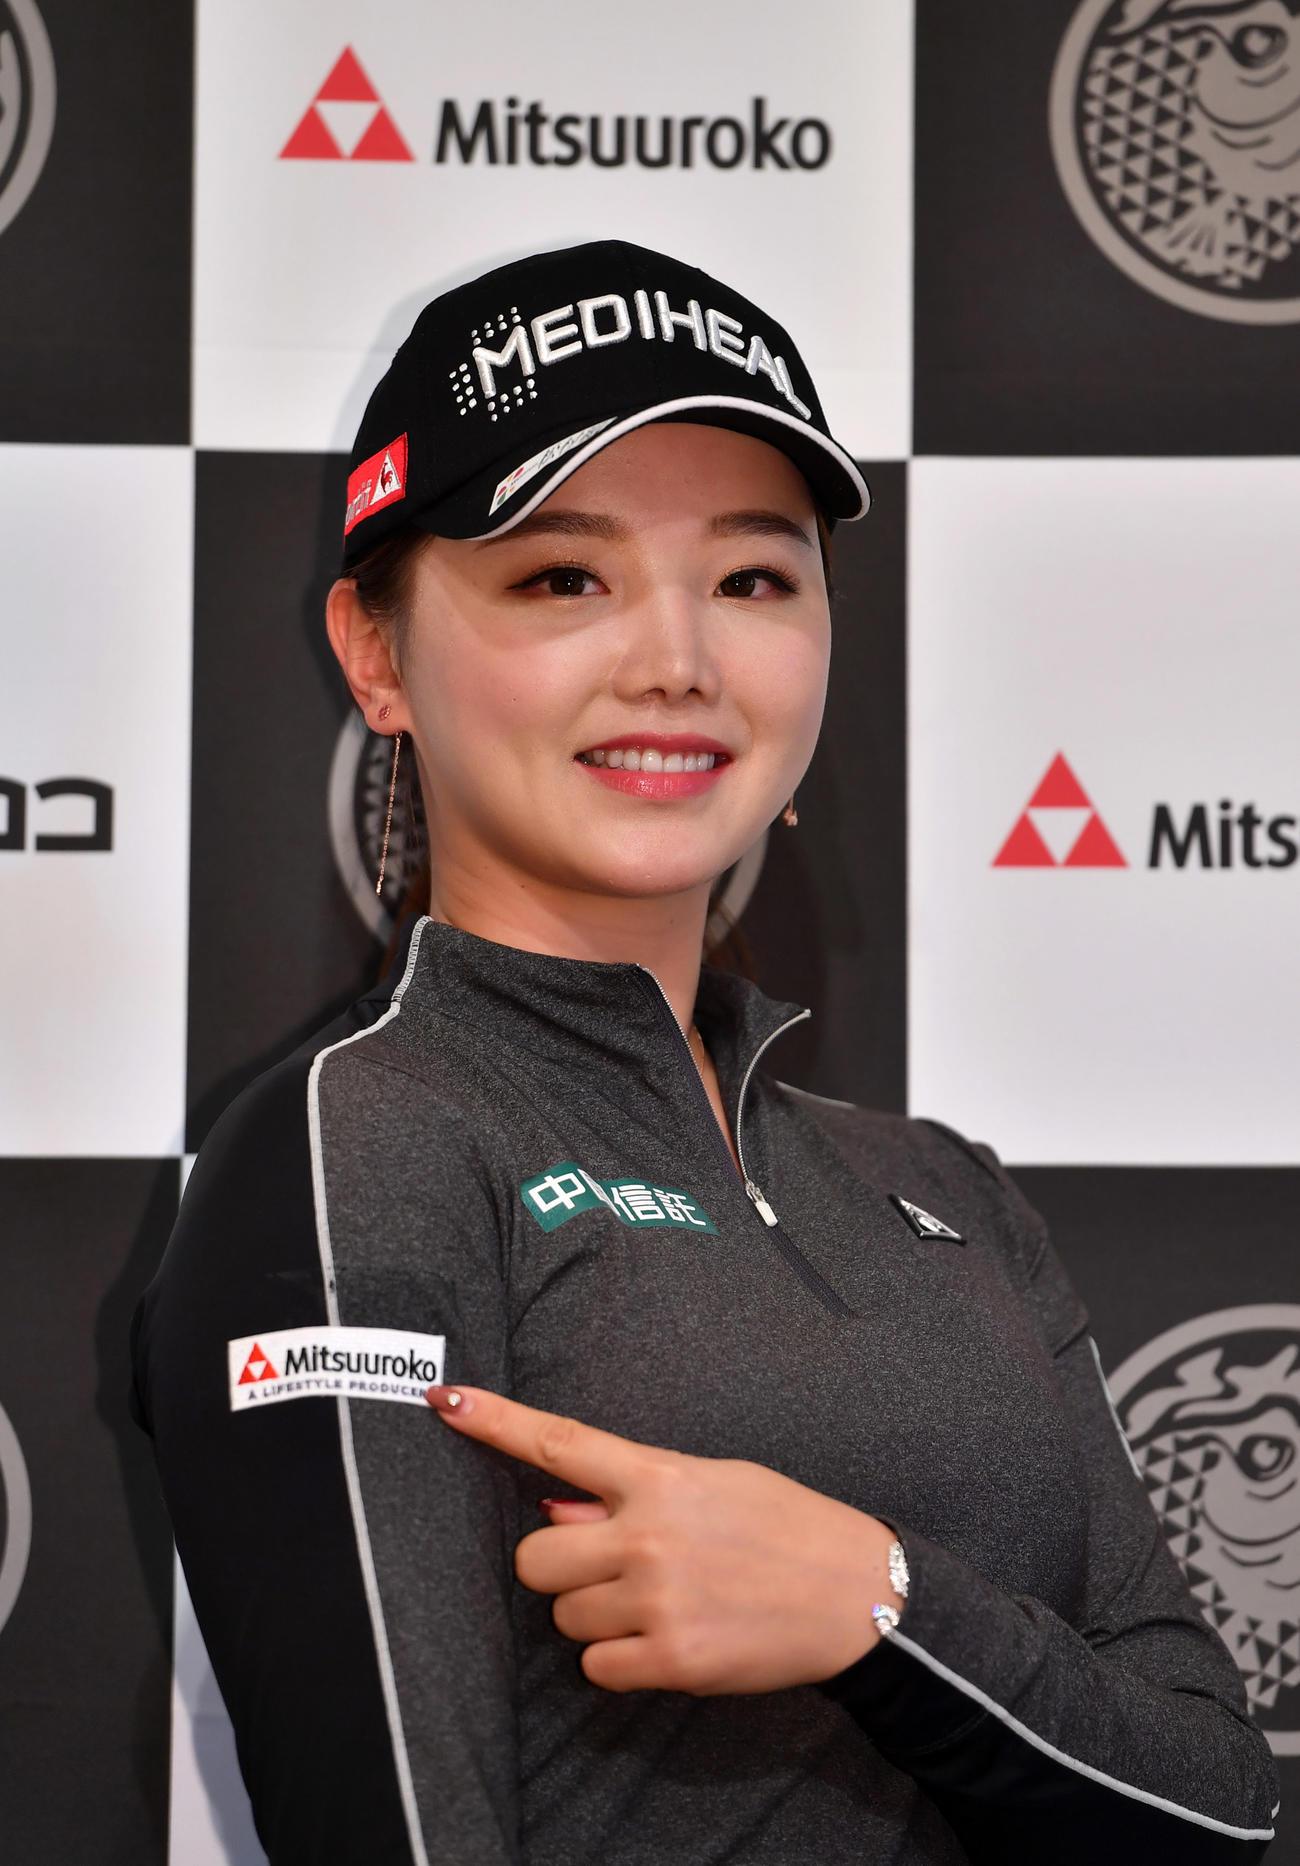 https://www.nikkansports.com/sports/golf/news/img/202002180000438-w1300_4.jpg